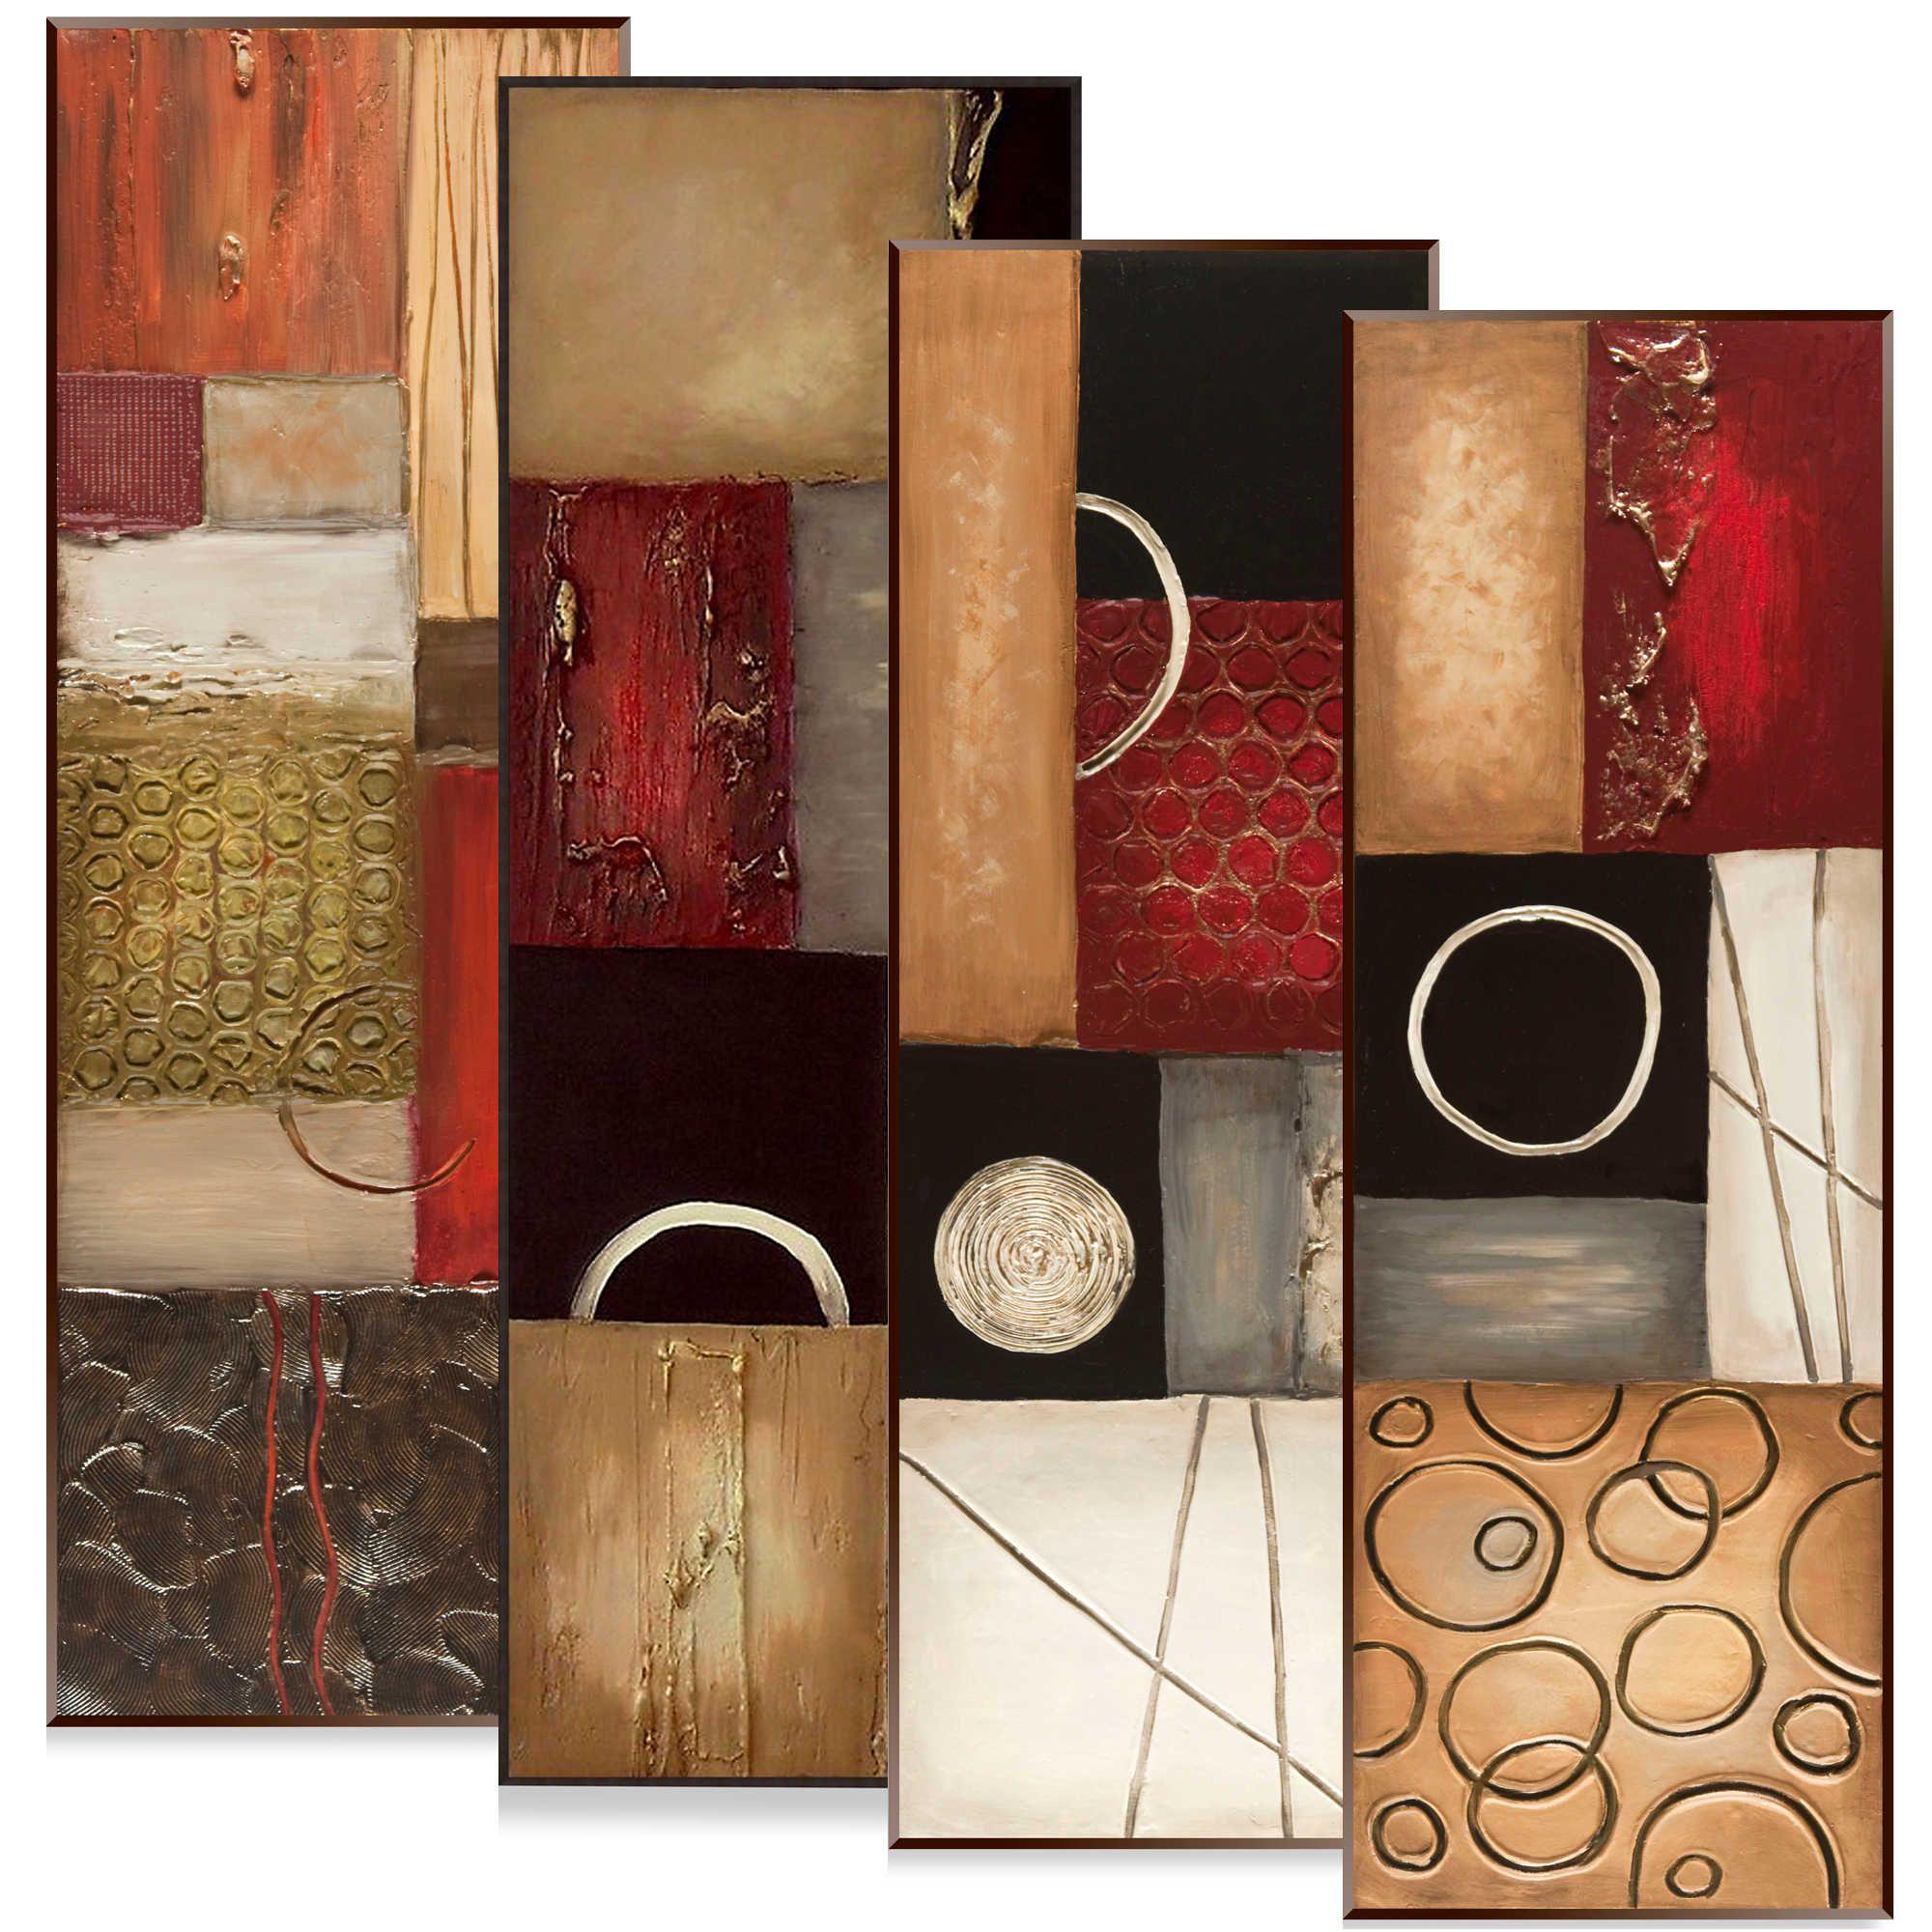 Textured panel wall art